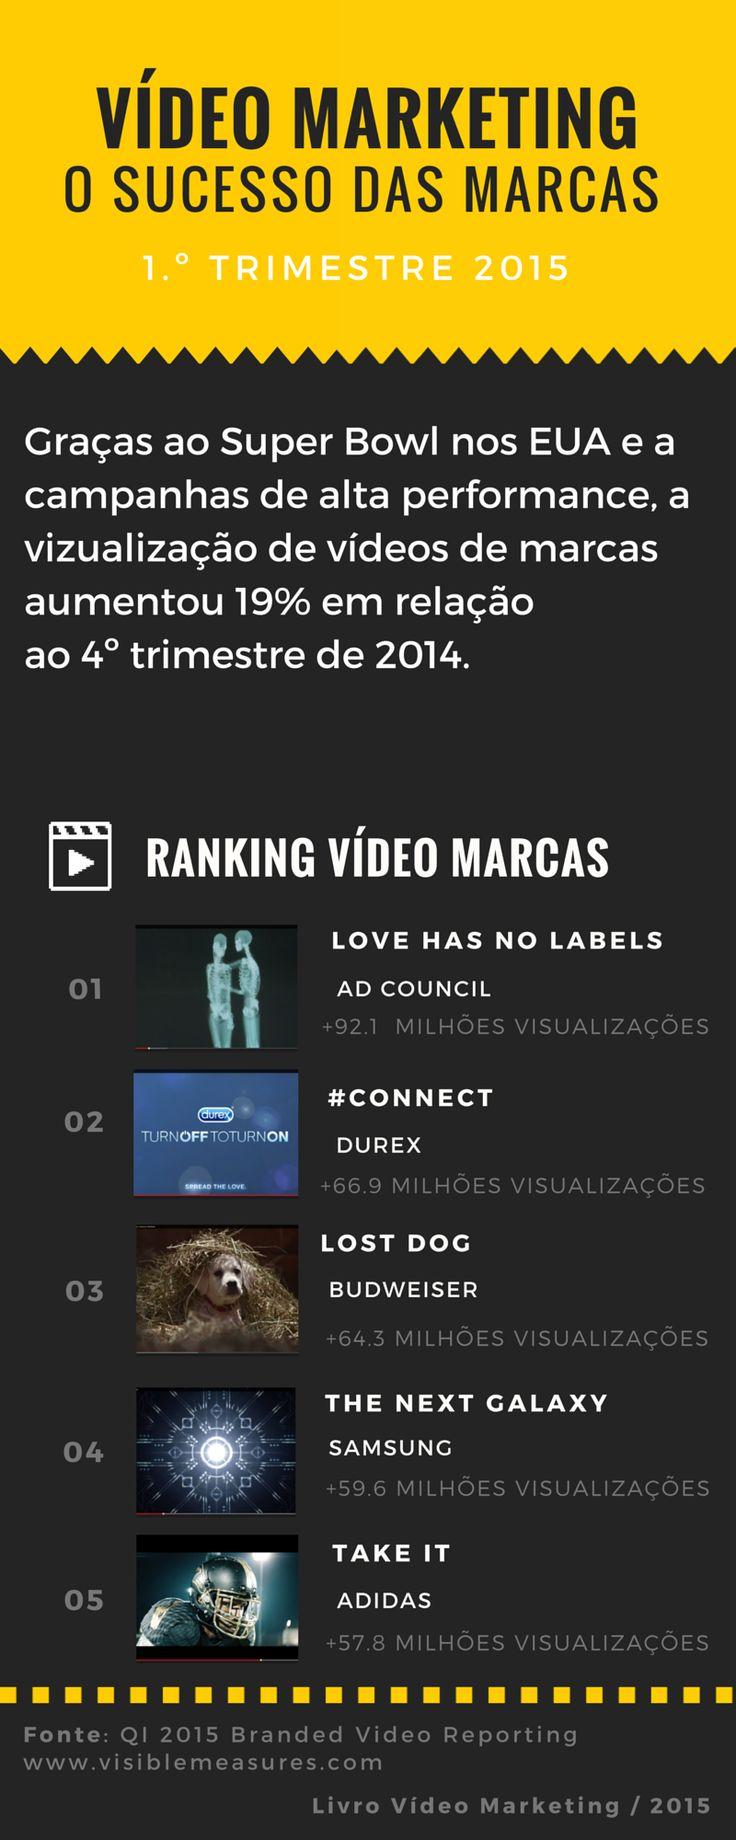 http://videomarketing360.net/ Ranking dos vídeos das marcas no 1º trimestre 2015 #videomarketing360